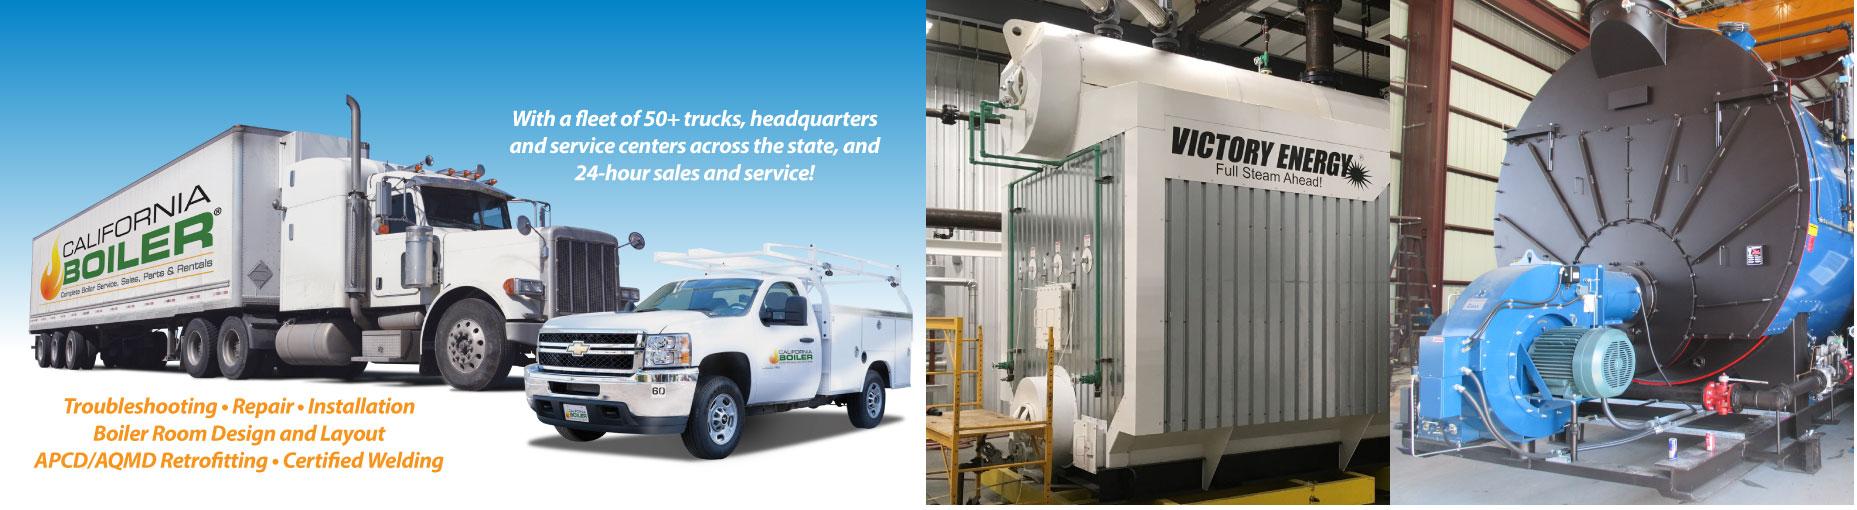 California Boiler   Boiler Service, Sales, Parts and Rental